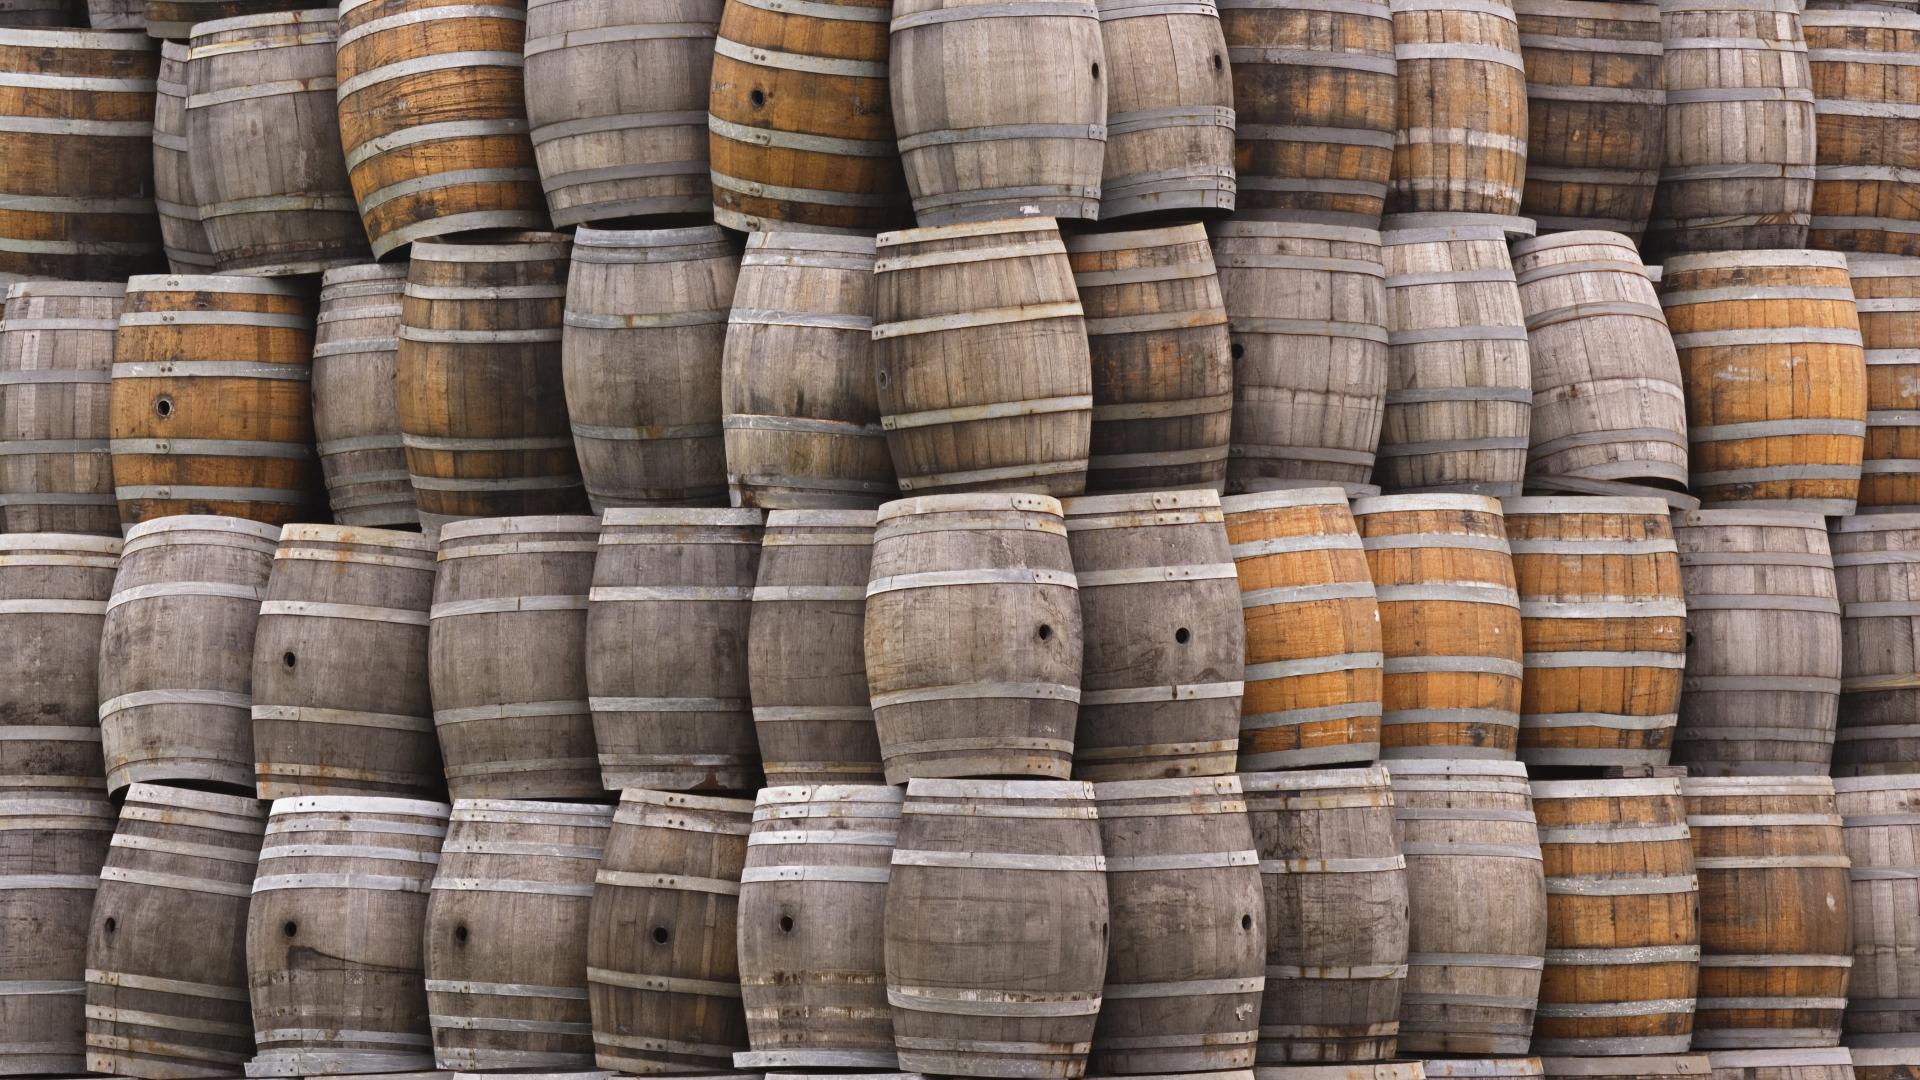 Man Made Barrel 1920x1080